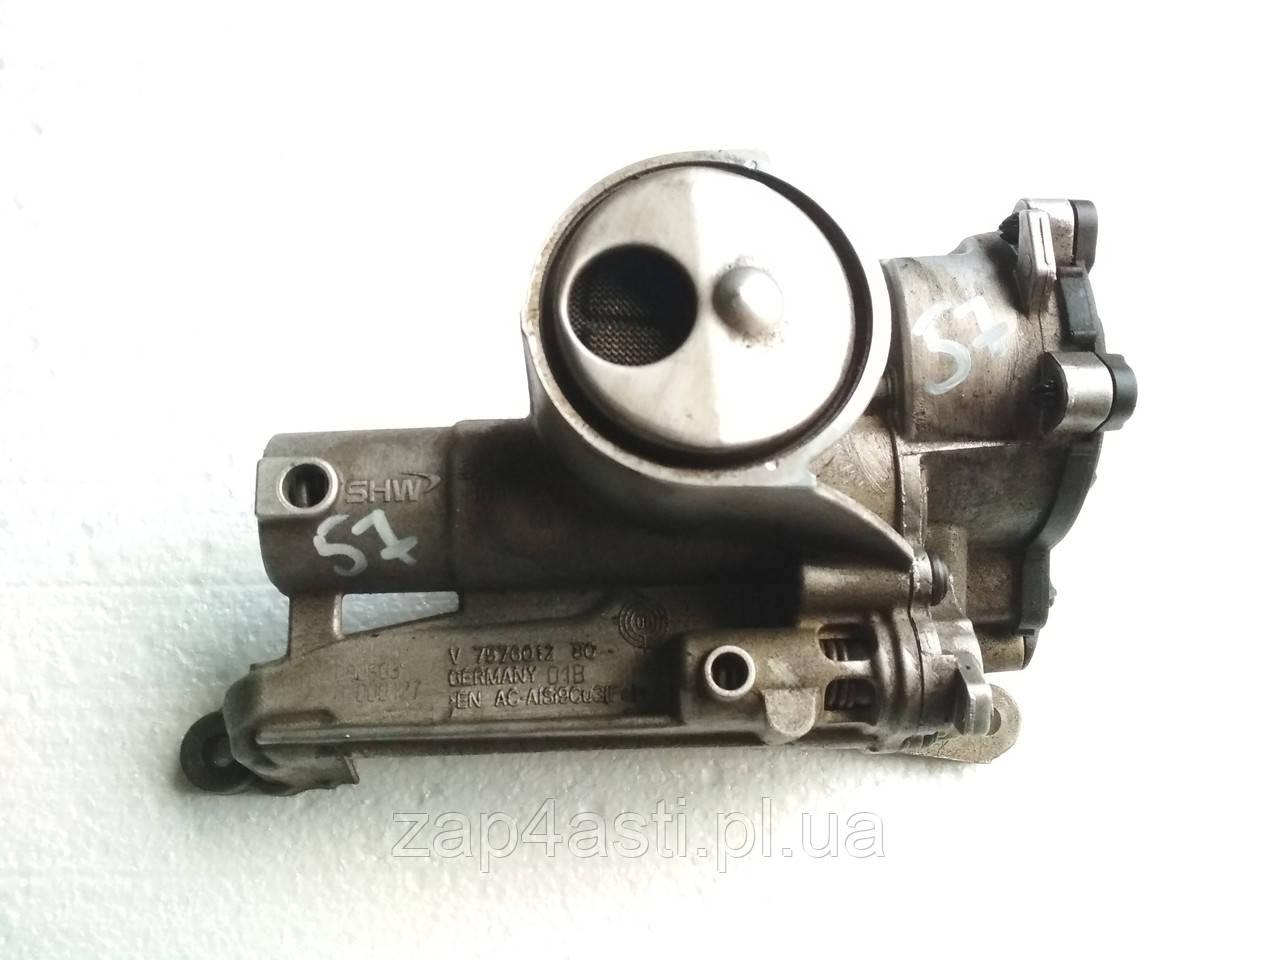 масляный насос V7576012 80 Bmw Mini Cooper R56 16 120 кс